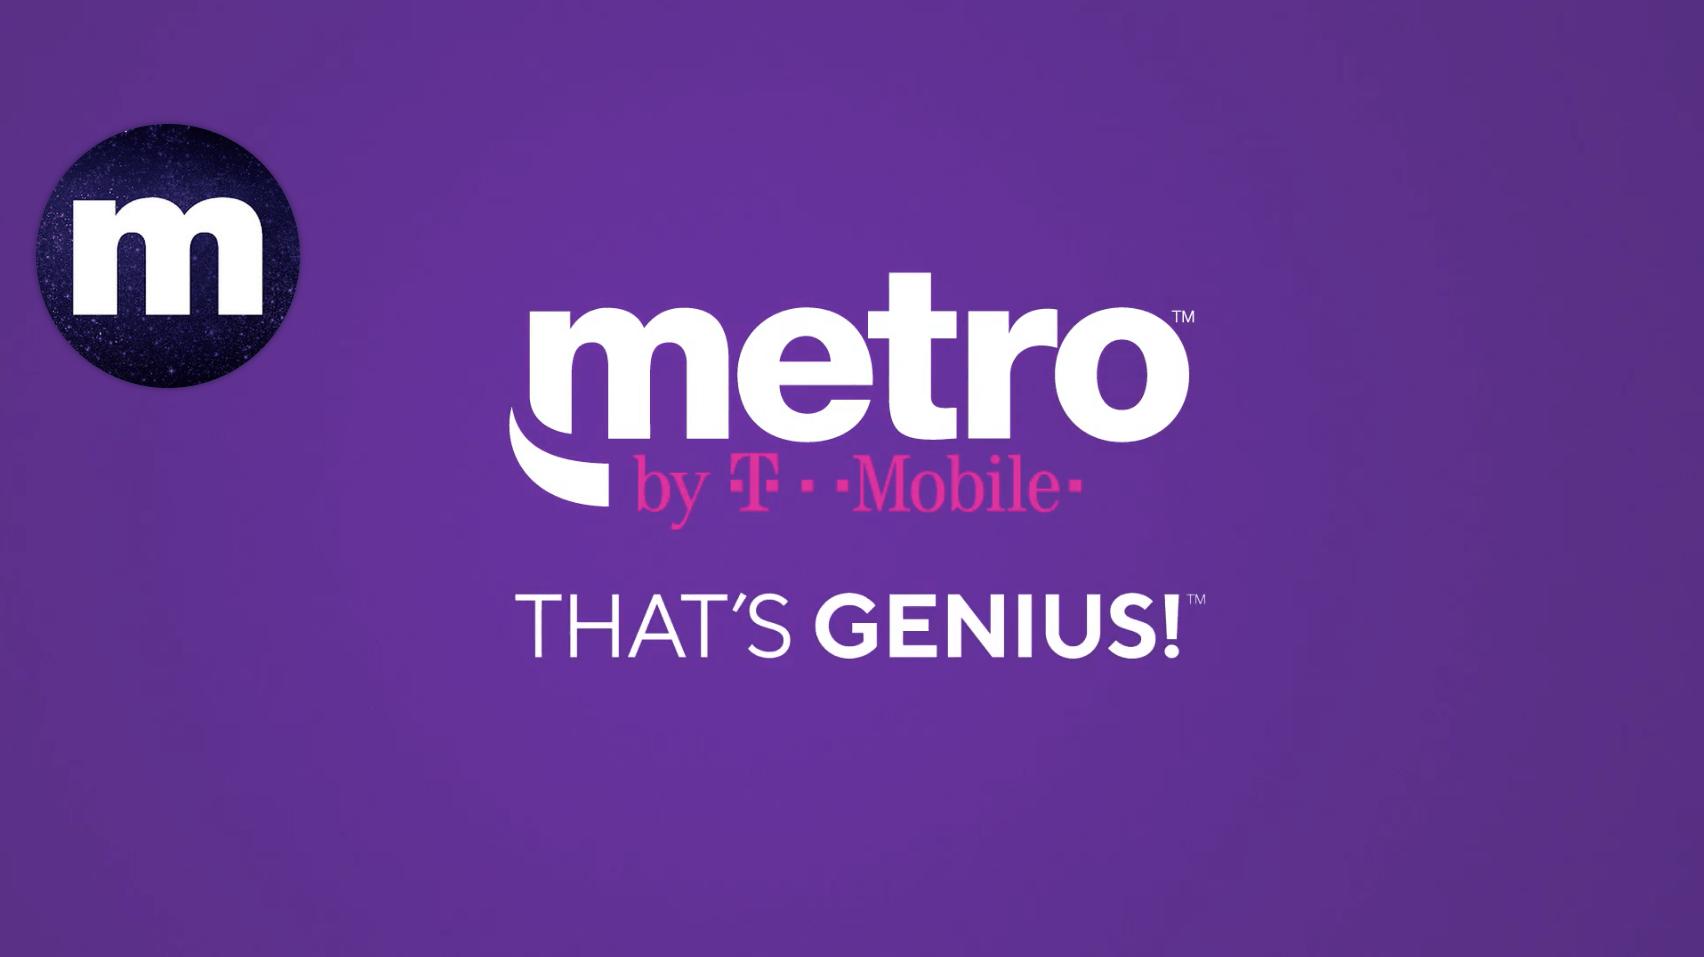 Metropcs Set For Rebrand New Plans Bundling Big Name Services How To Plan Rebranding Tmobile